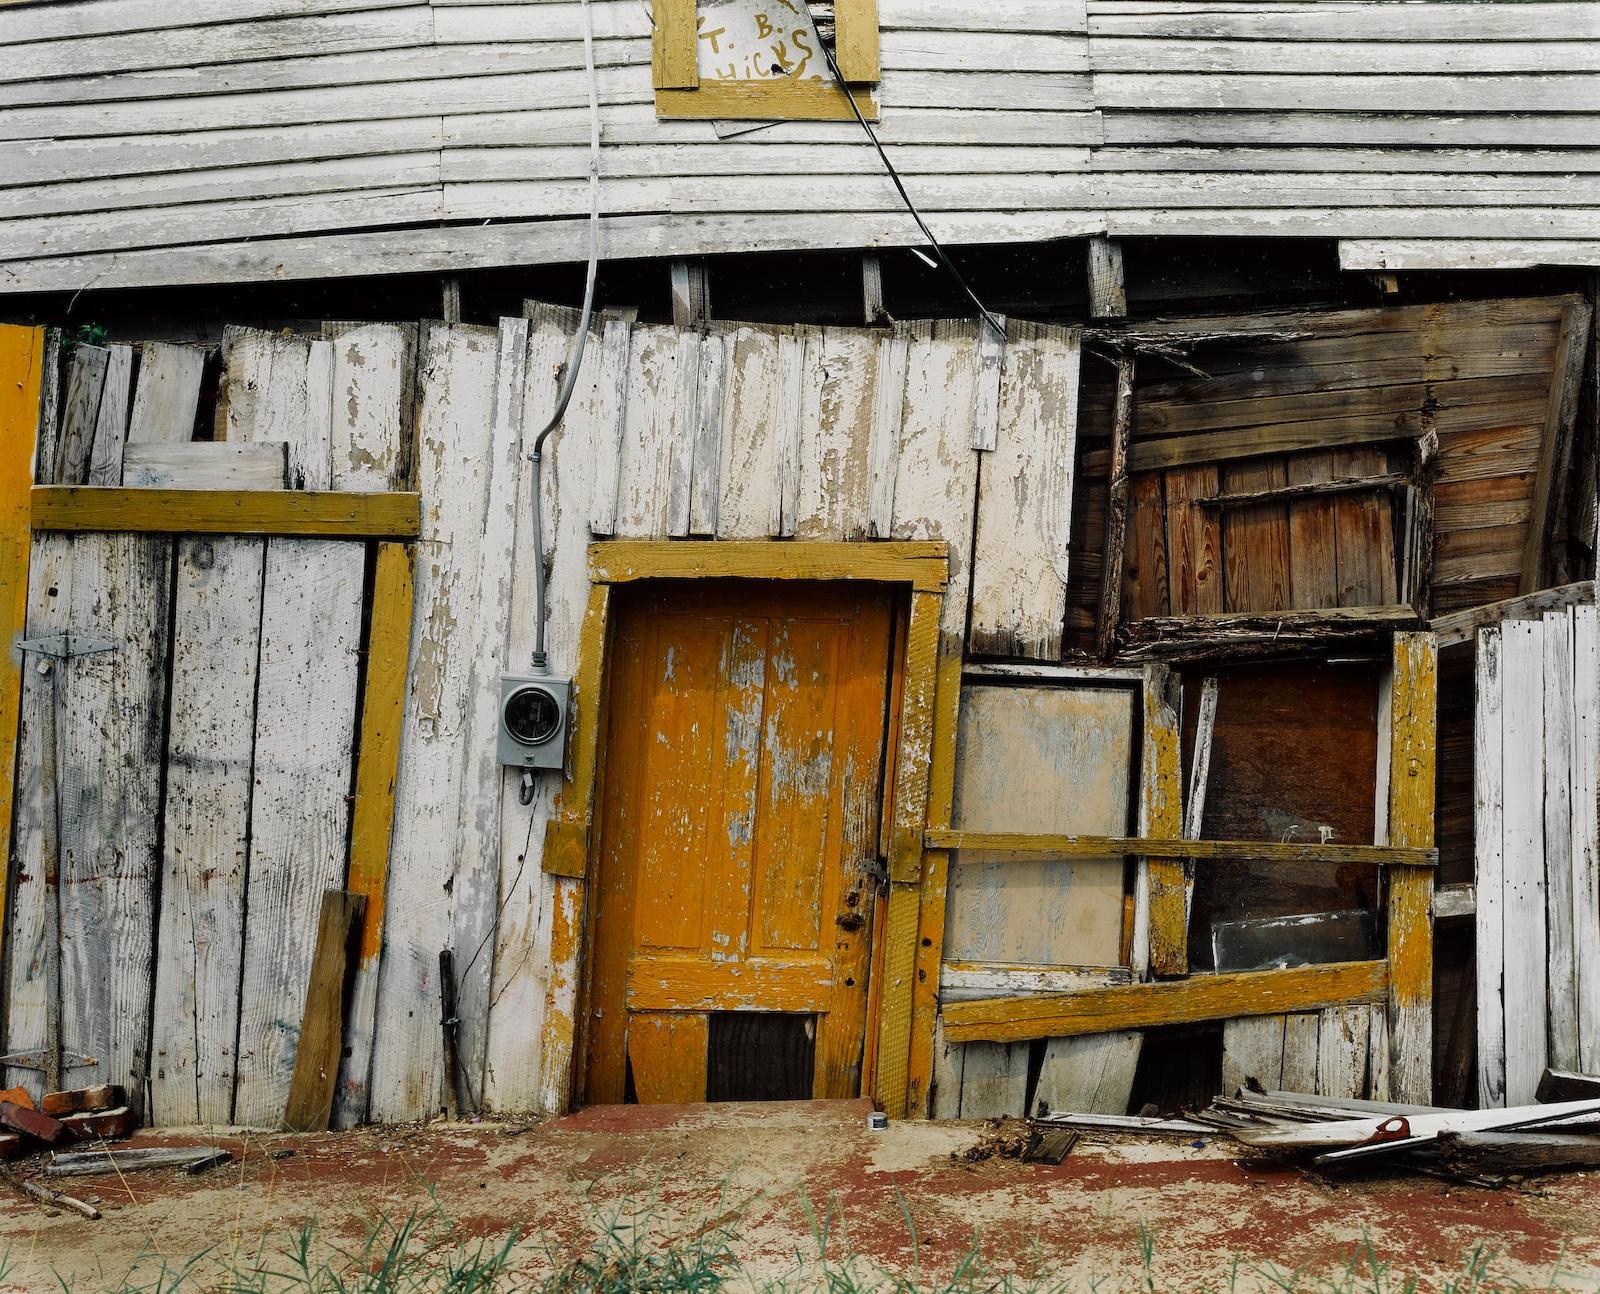 TB Hicks 'Store (Detail), Newbern, Alabama, 1991 © William Christenberry